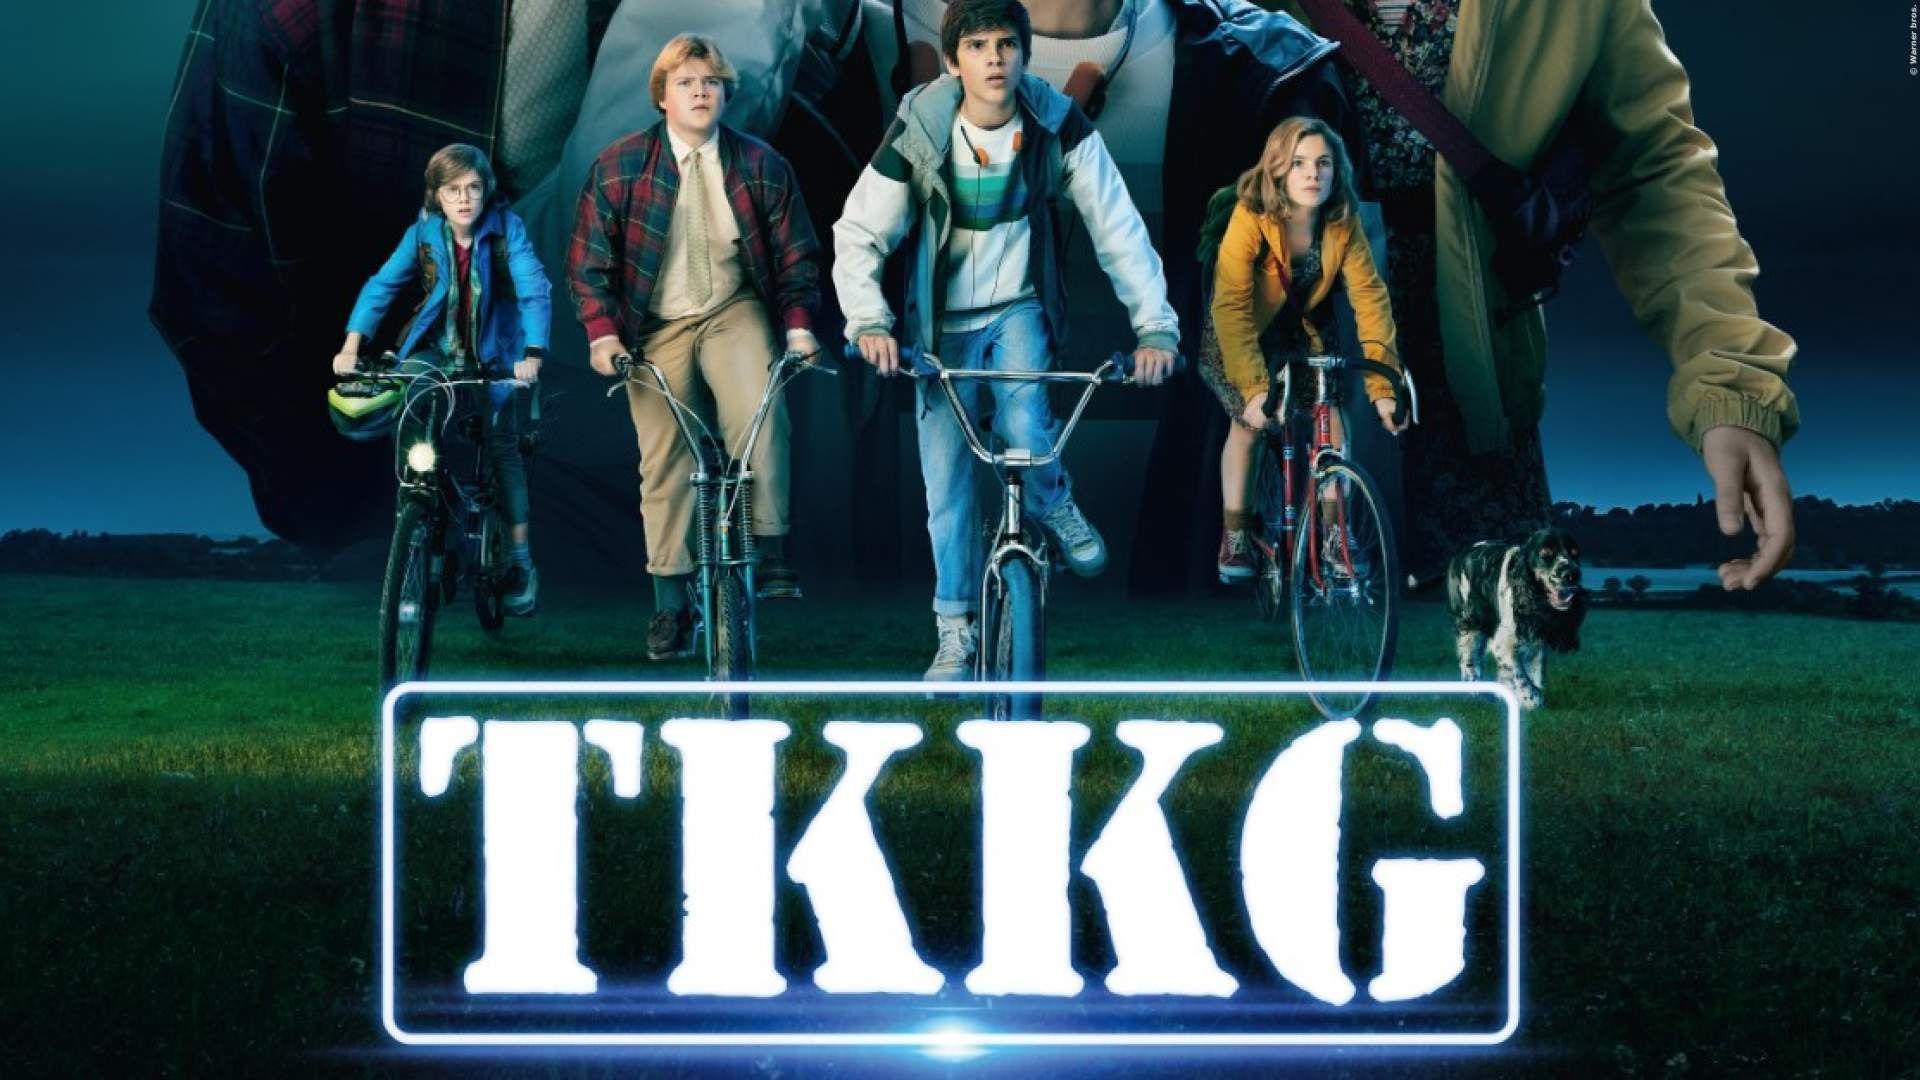 Tkkg Der Anfang Der Legende Als Kinofilm 1 Trailer Tkkg Kino Film Kino